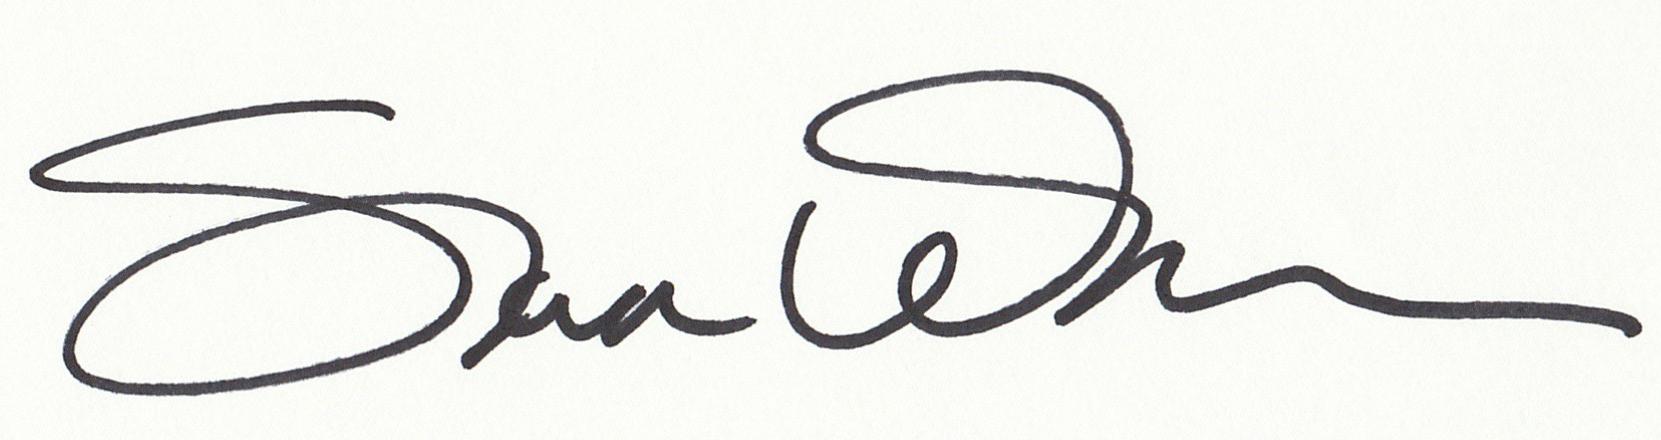 Sondra Wampler's Signature